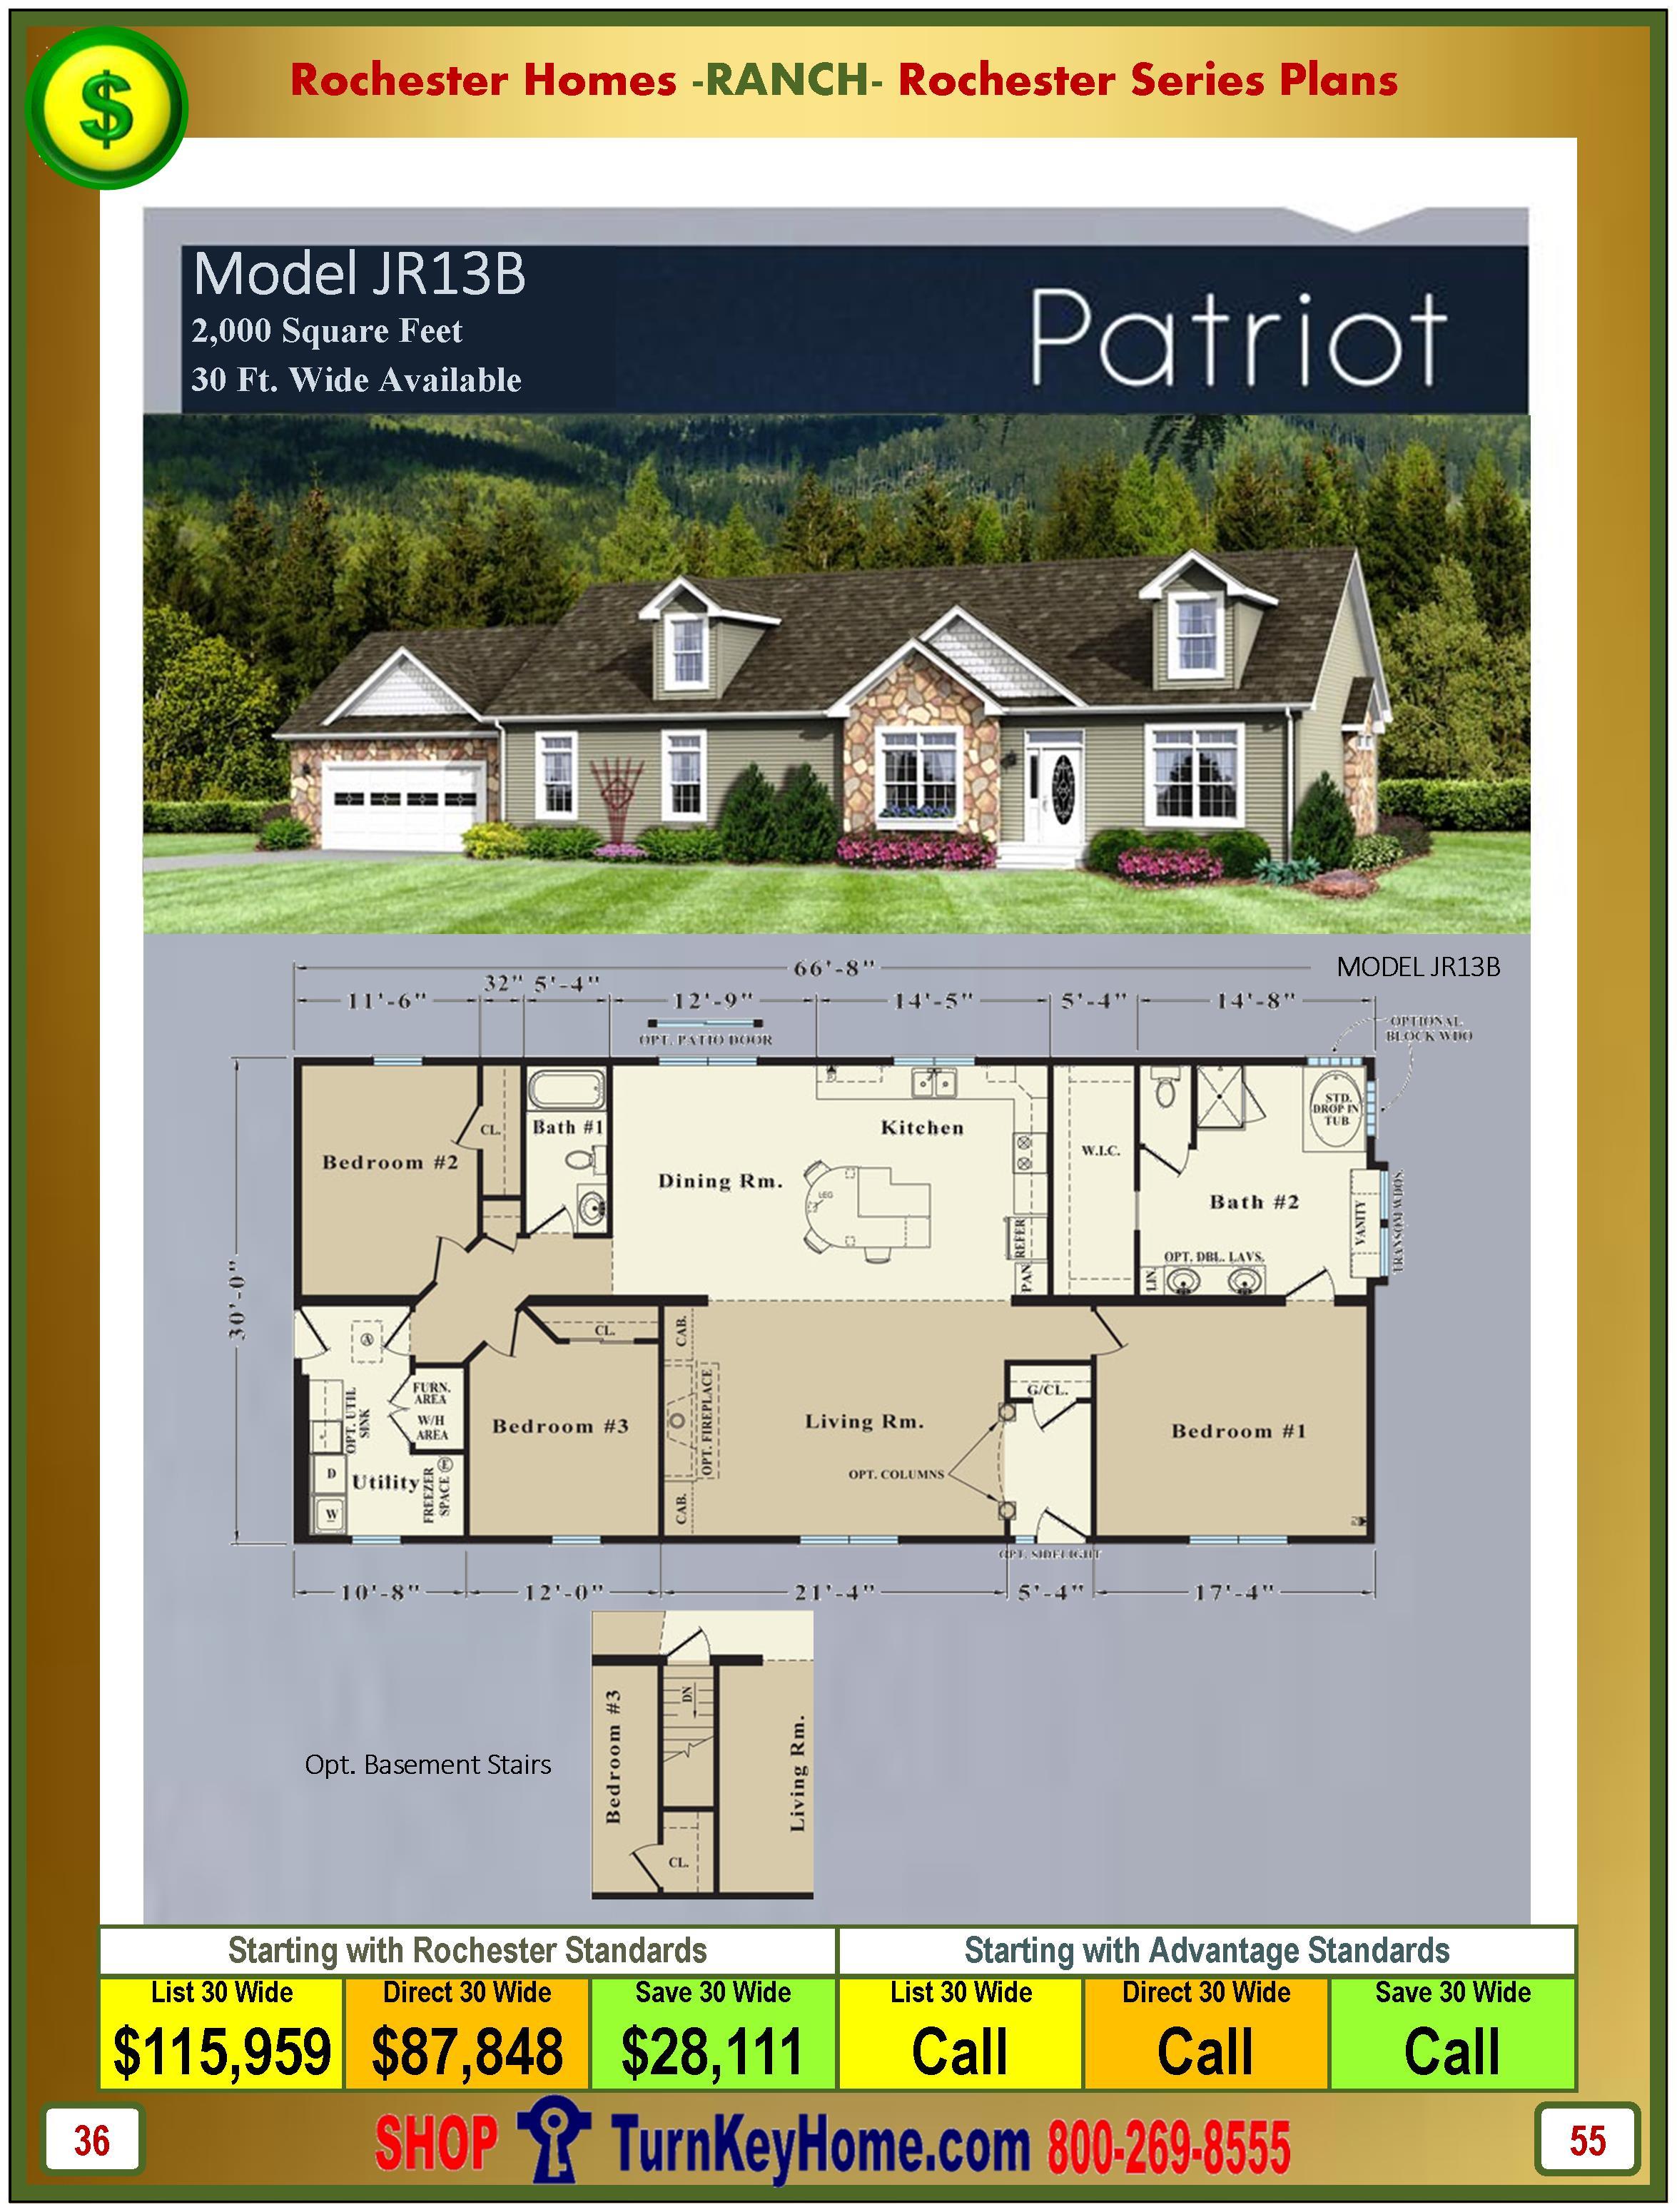 Modular.Homes.Rochester.Home.Inc.Patriot.JR13B.Ranch.Plan.Price.Catalog.P55.1215